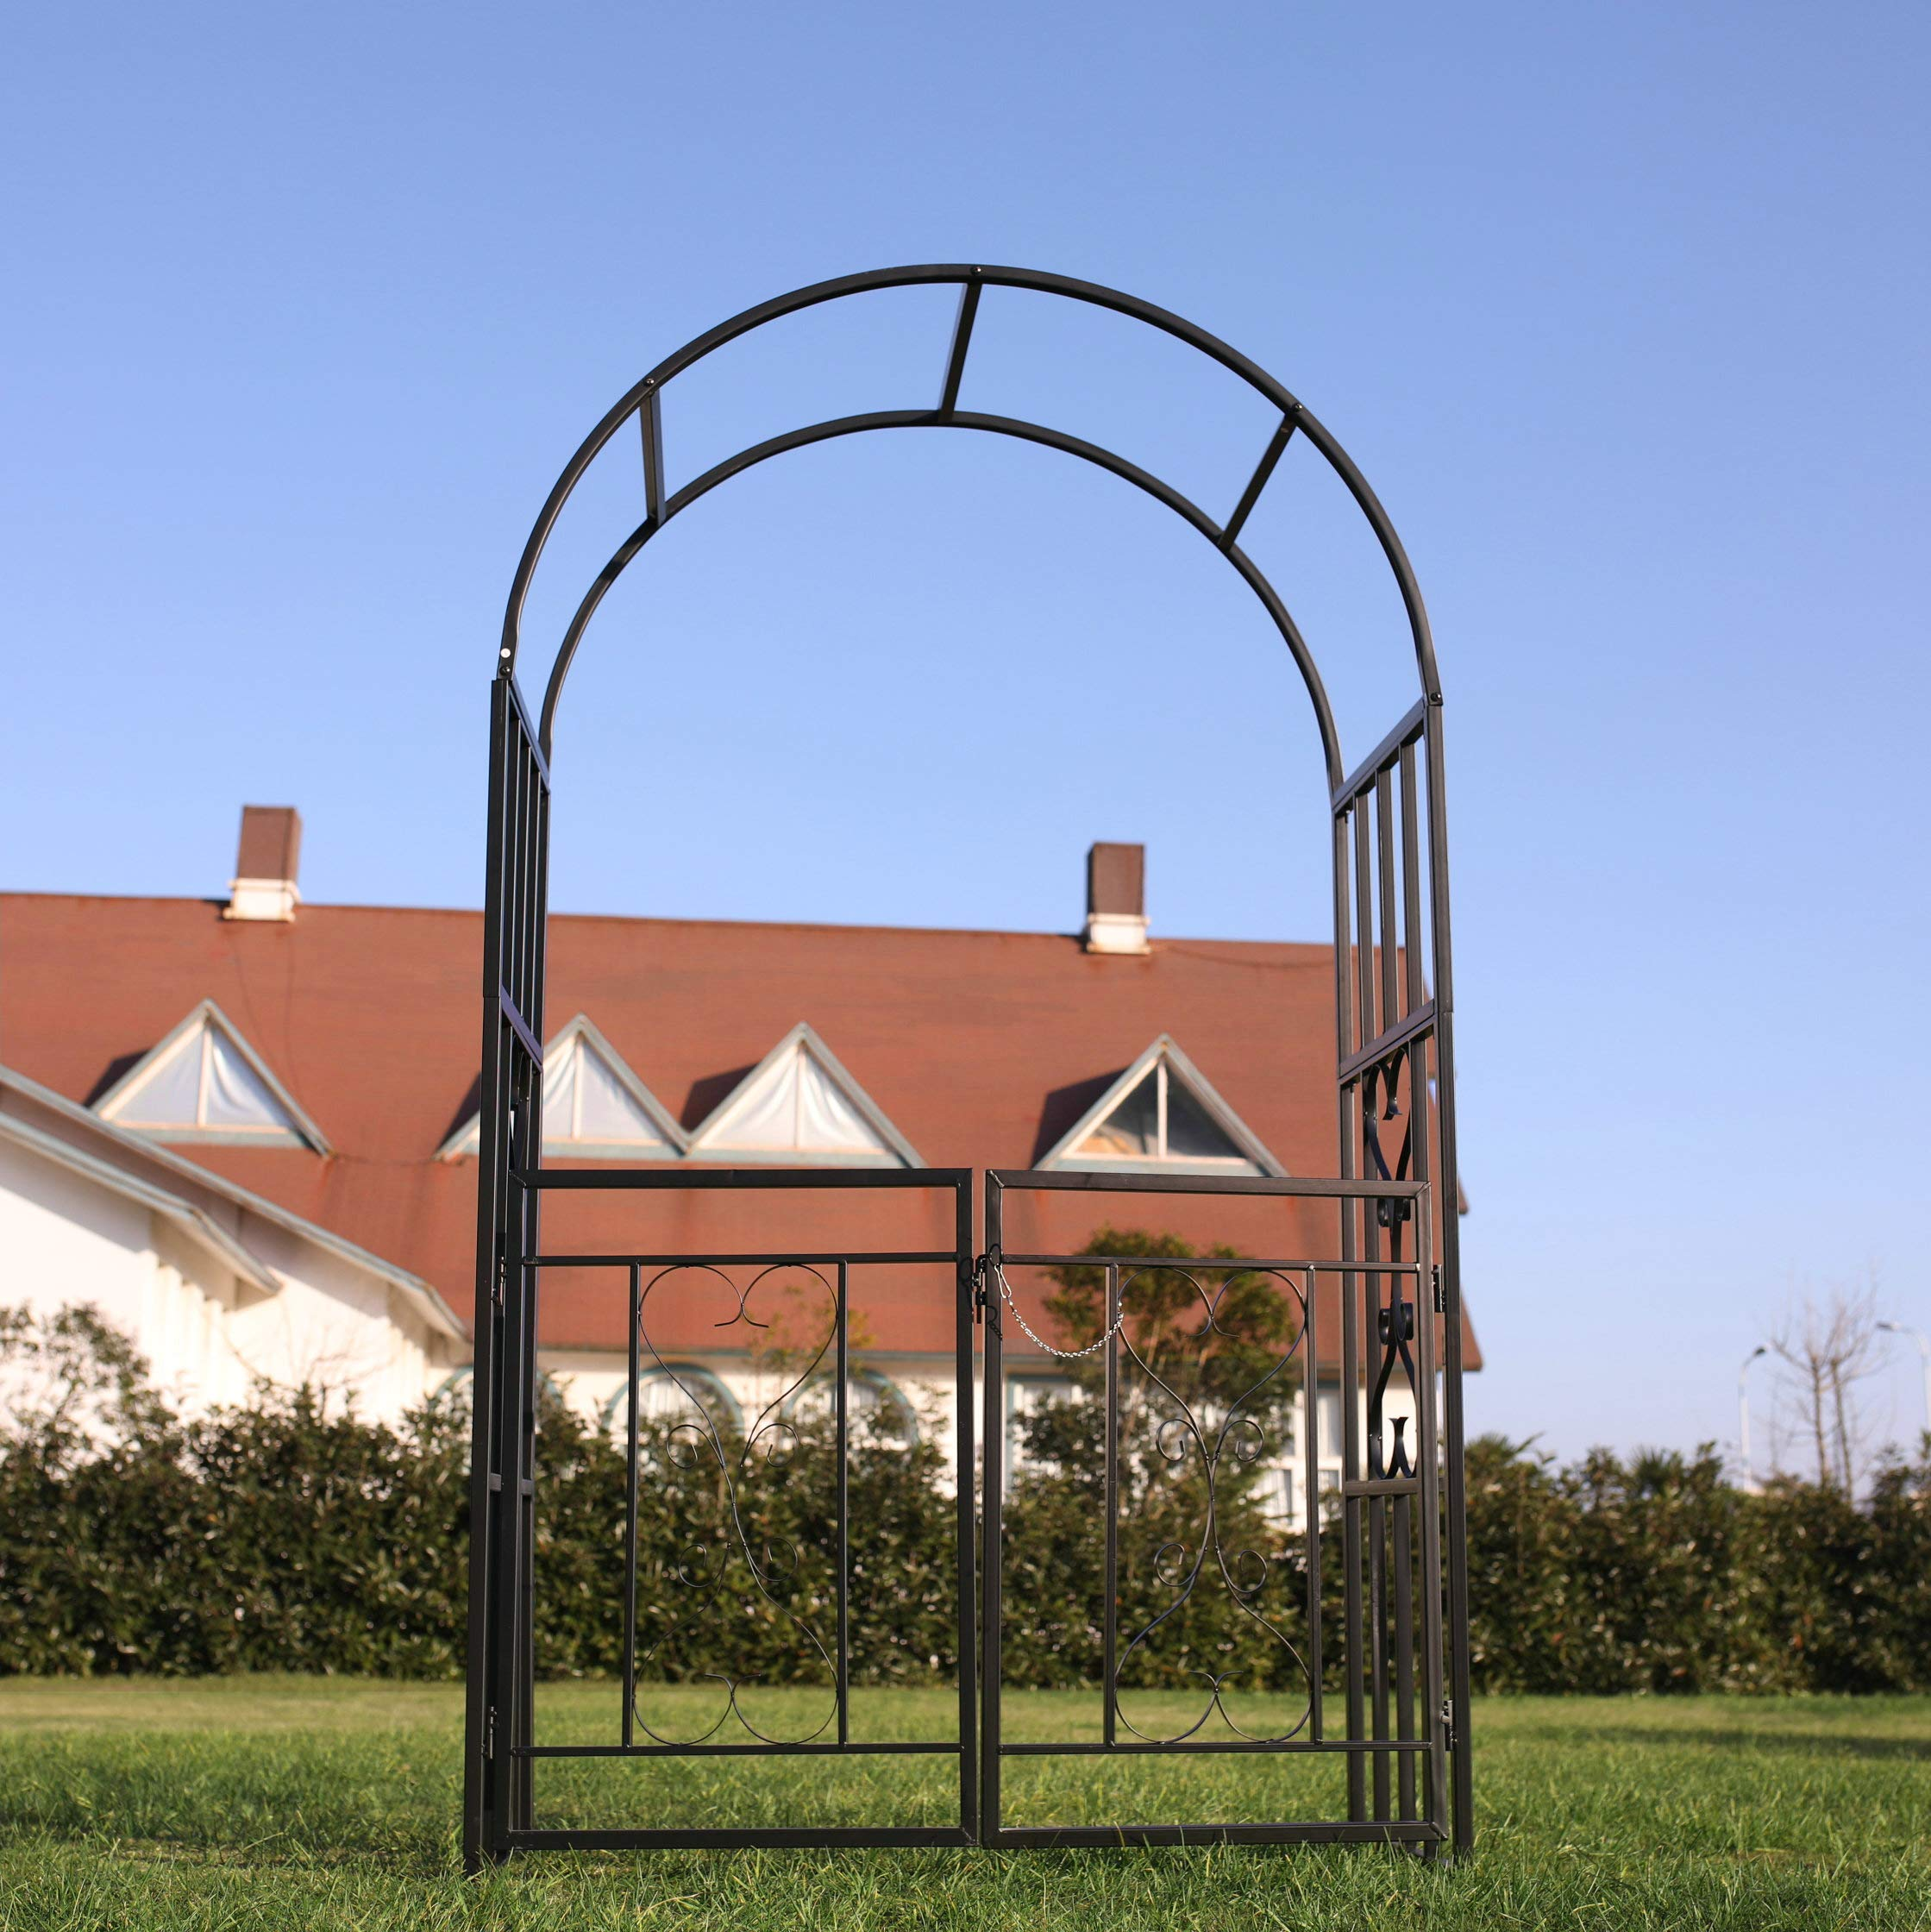 1. GO Steel Garden Arch with Gate, 6'7'' High x 3'7'' Wide, Garden Arbor for Various Climbing Plant, Outdoor Garden Lawn Backyard by 1. GO (Image #4)